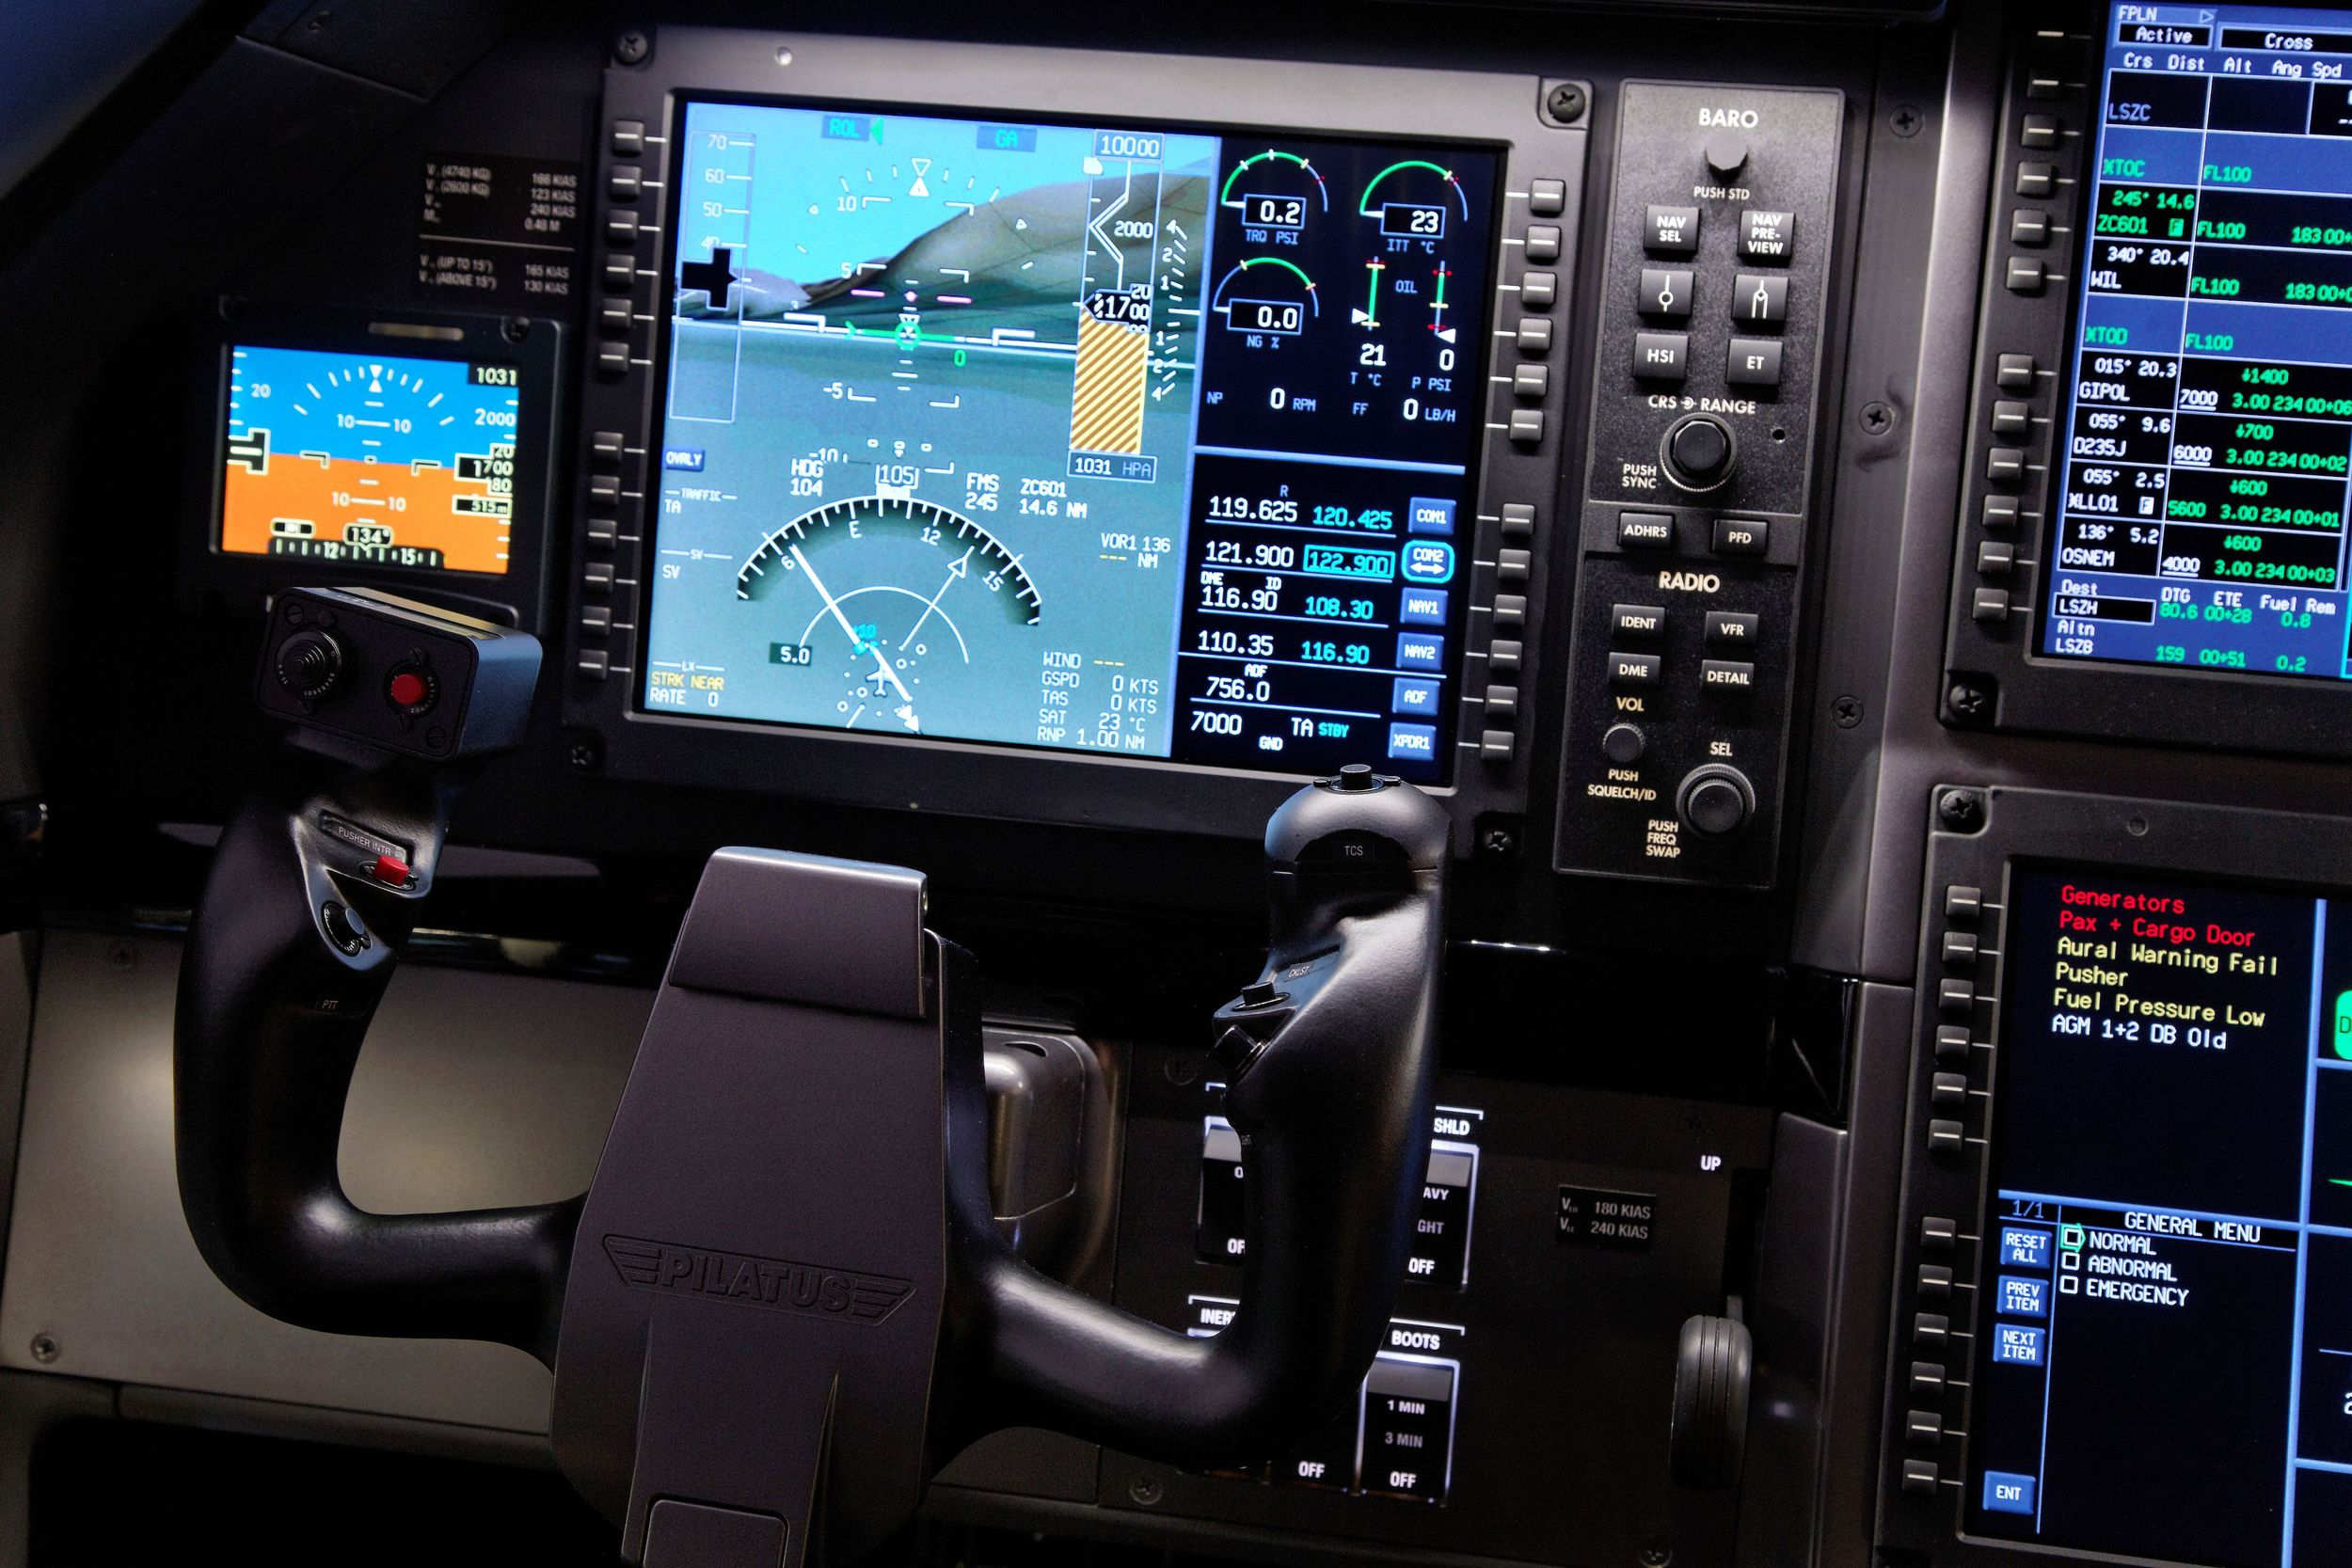 Modern avionics for safety.